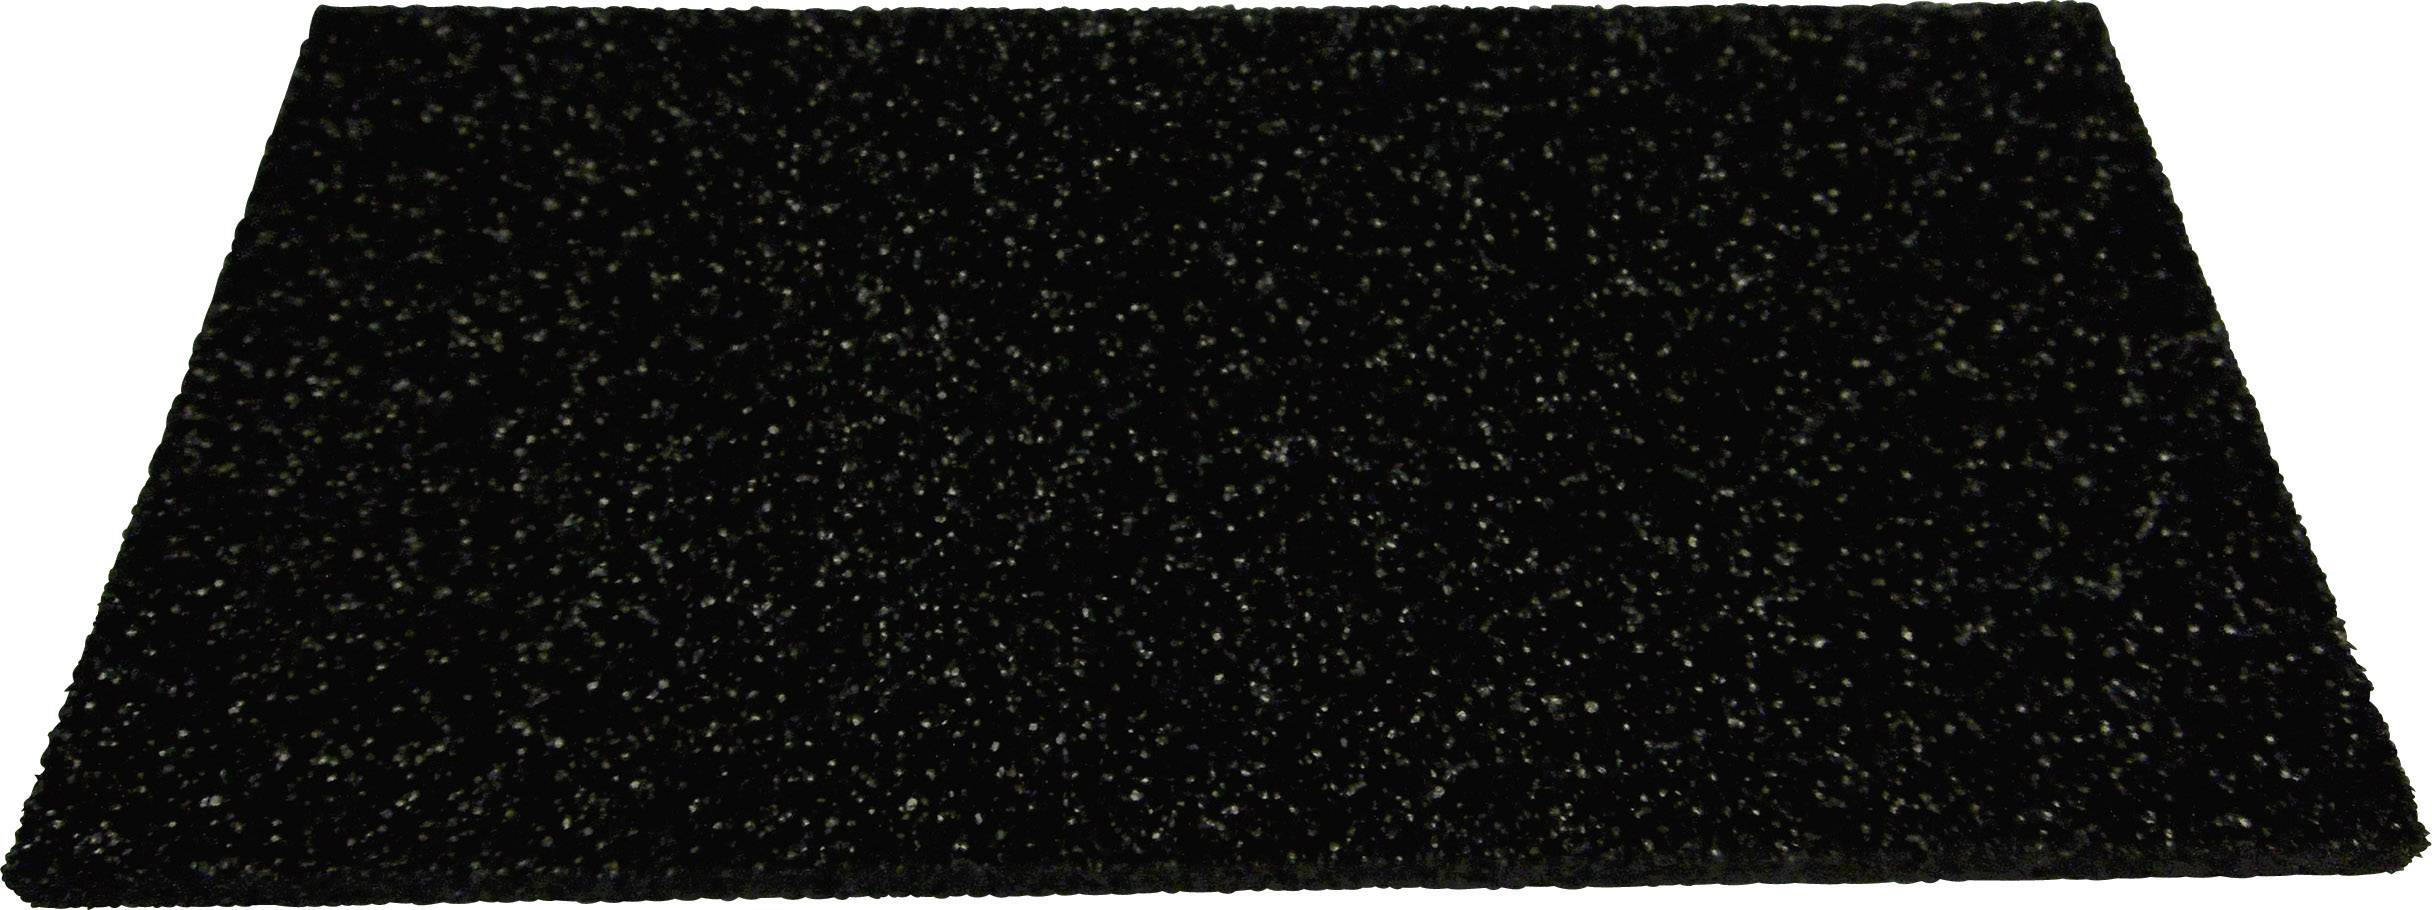 394611, (d x š x v) 150 x 75 x 5 mm, čierna